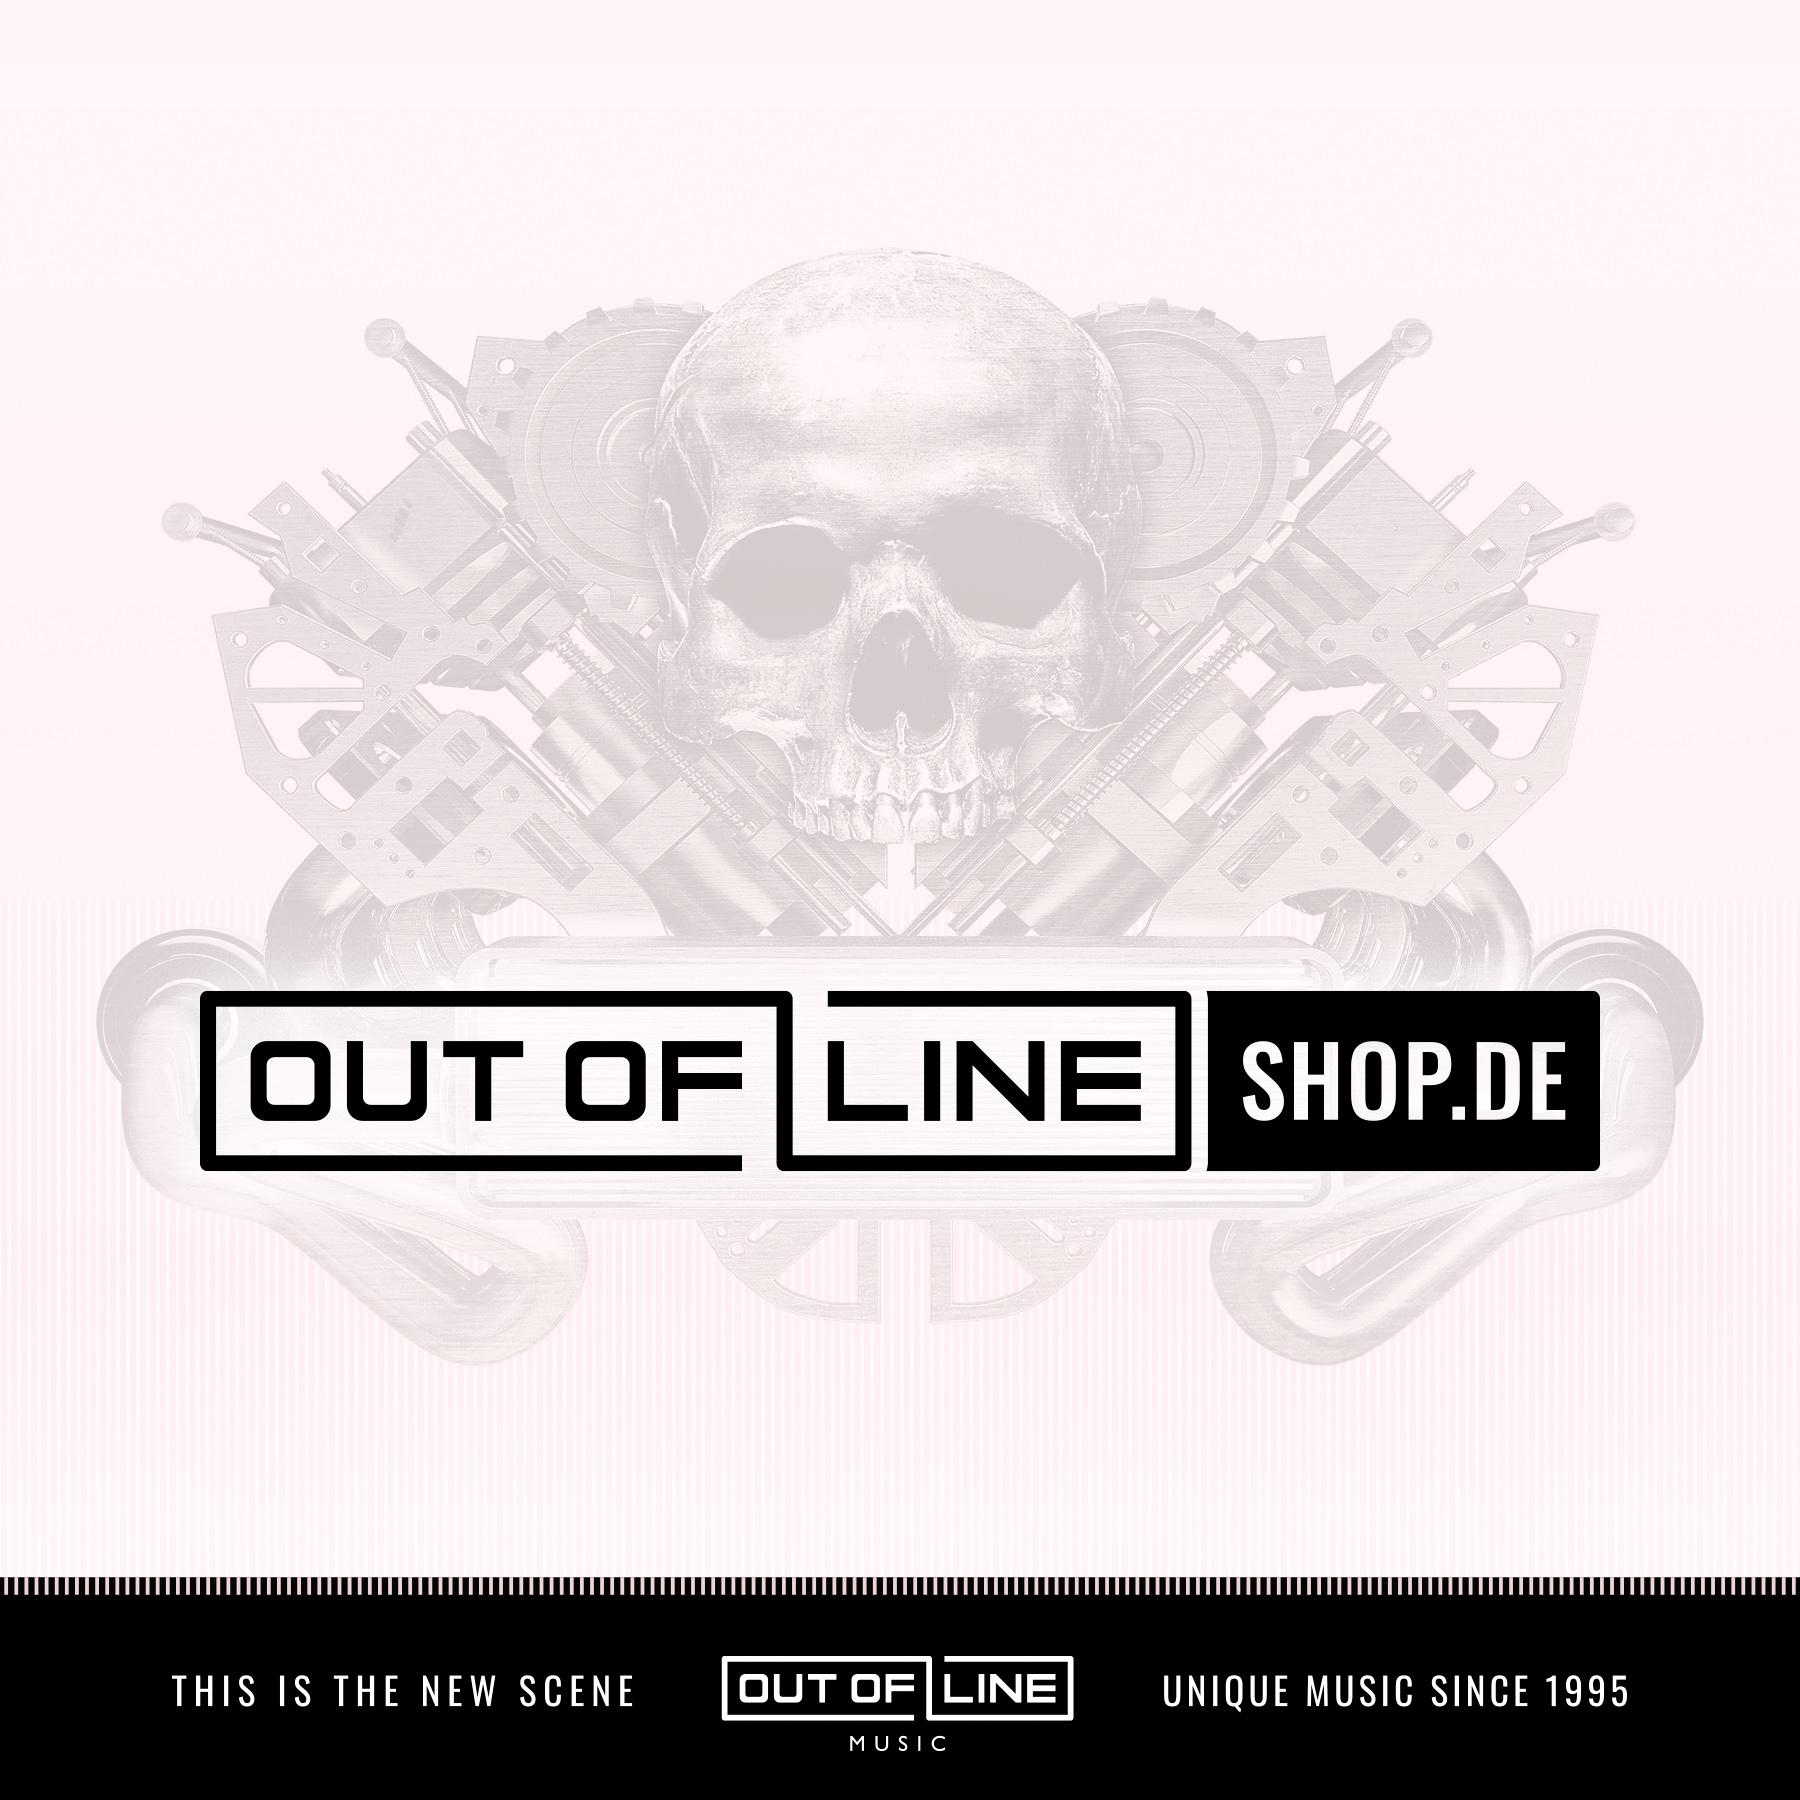 Blutengel - Leitbild (Limited SILVER Vinyl) - 2LP+CD  (B-Ware !!)